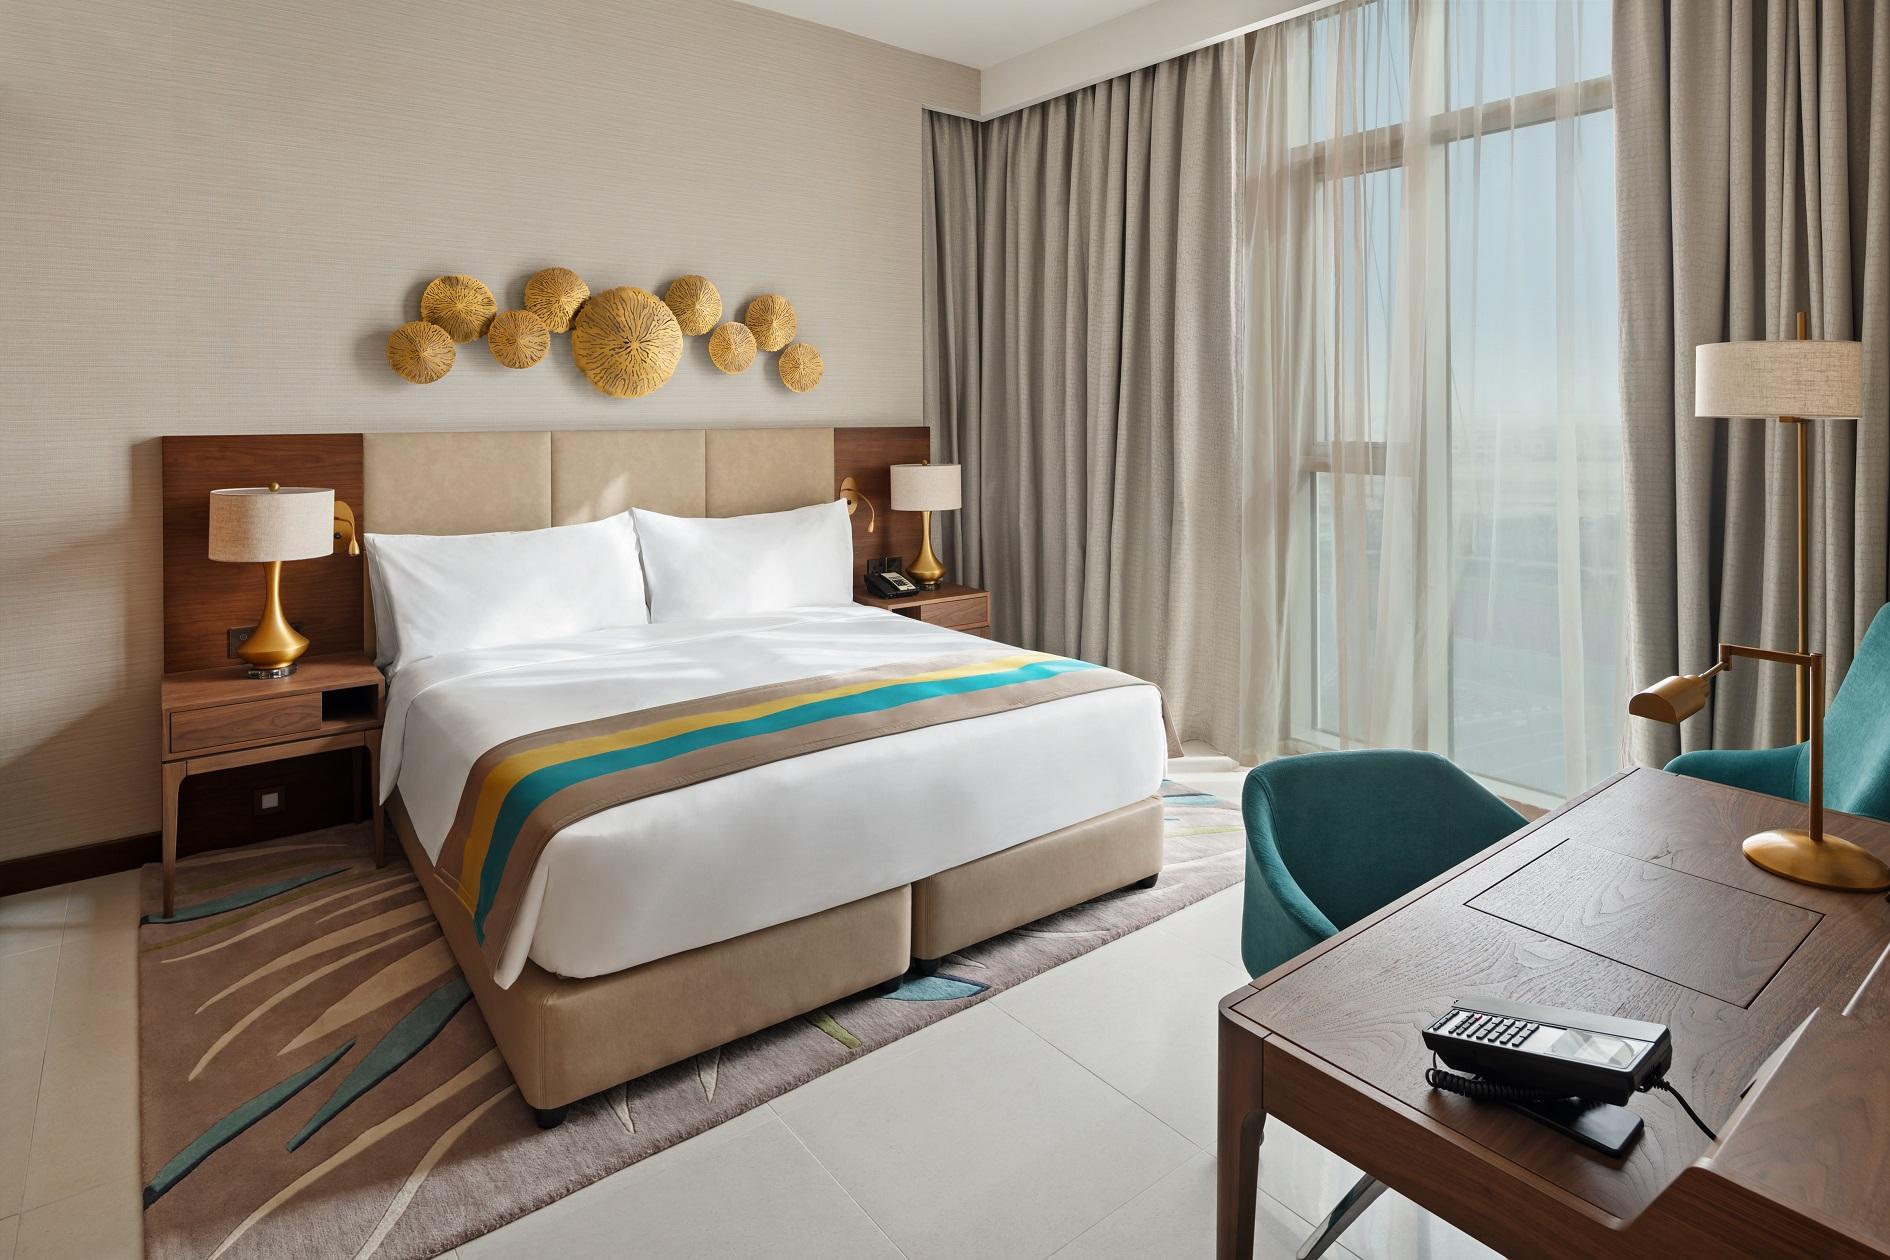 فندق هوليداي إن مطار آل مكتوم